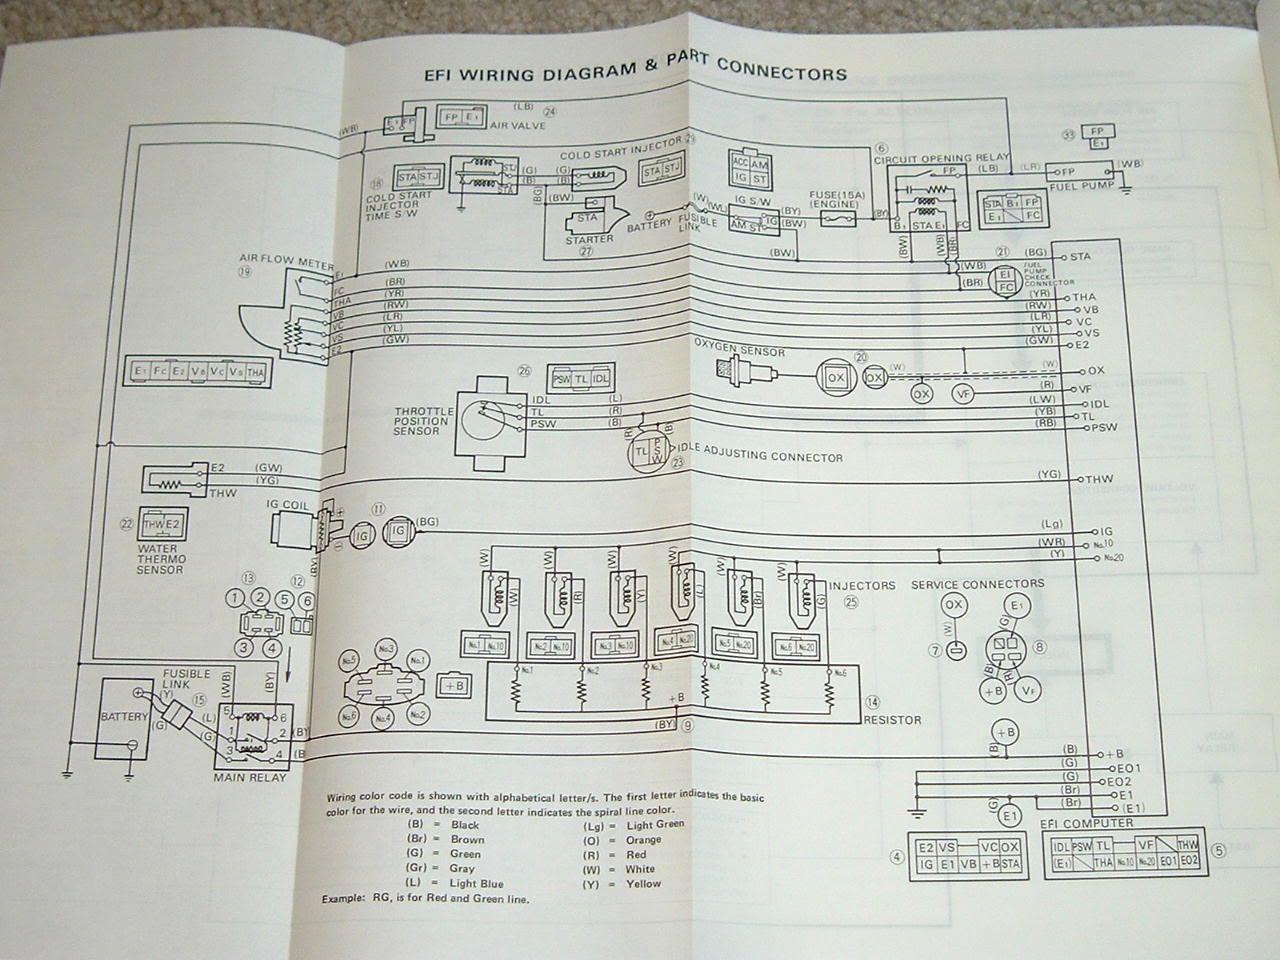 pioneer deh p3600 wiring diagram. Black Bedroom Furniture Sets. Home Design Ideas